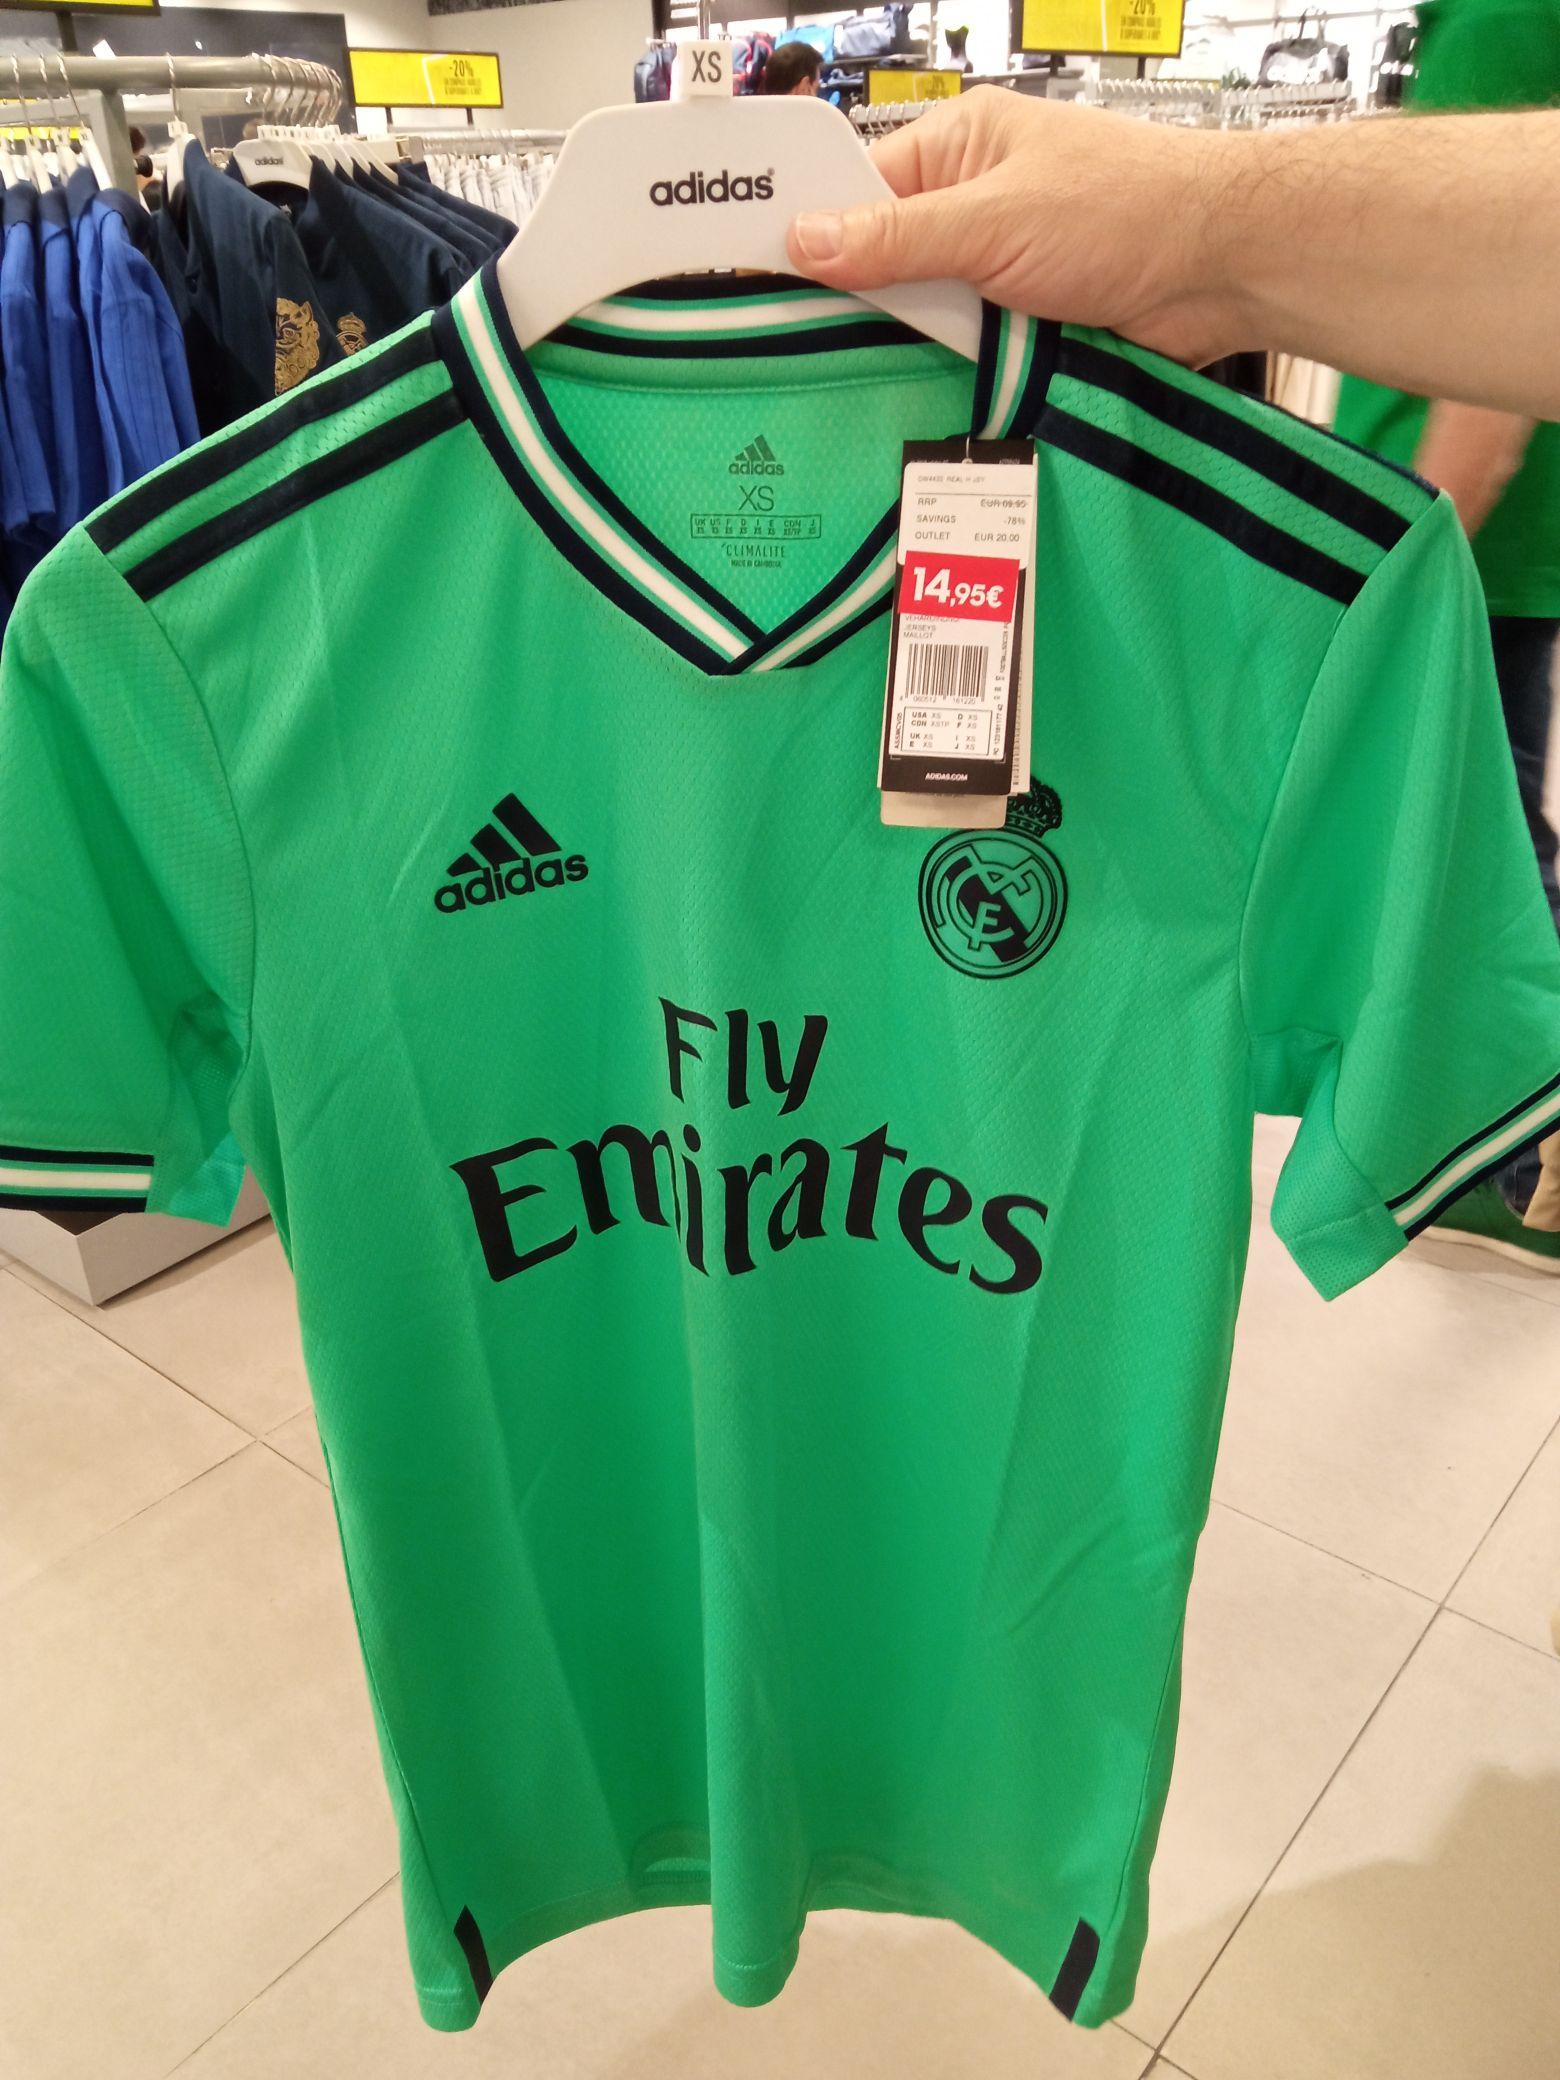 2ª equipación Real Madrid 19/20 Original (Outlet Adidas)